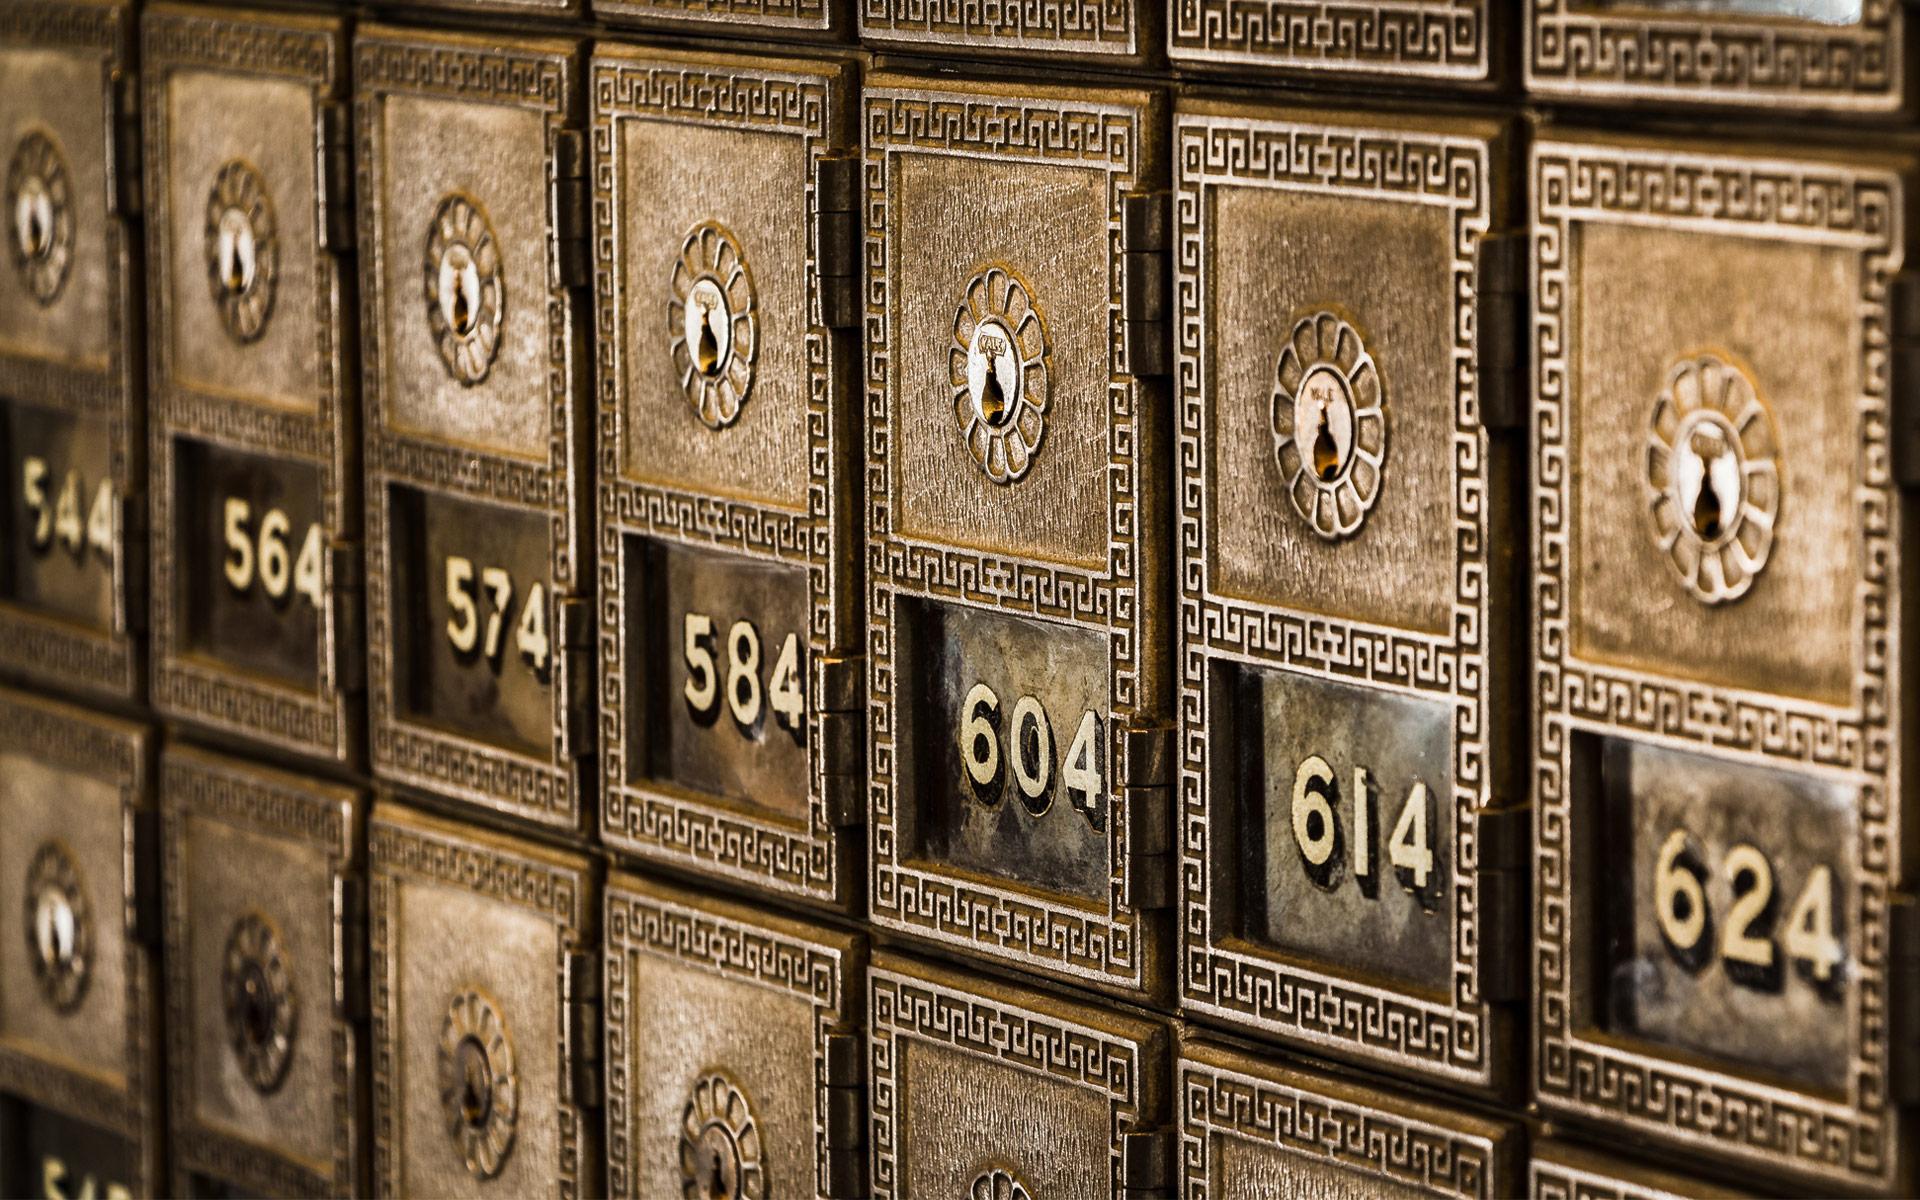 Standout-Image-Safe-deposit-boxes